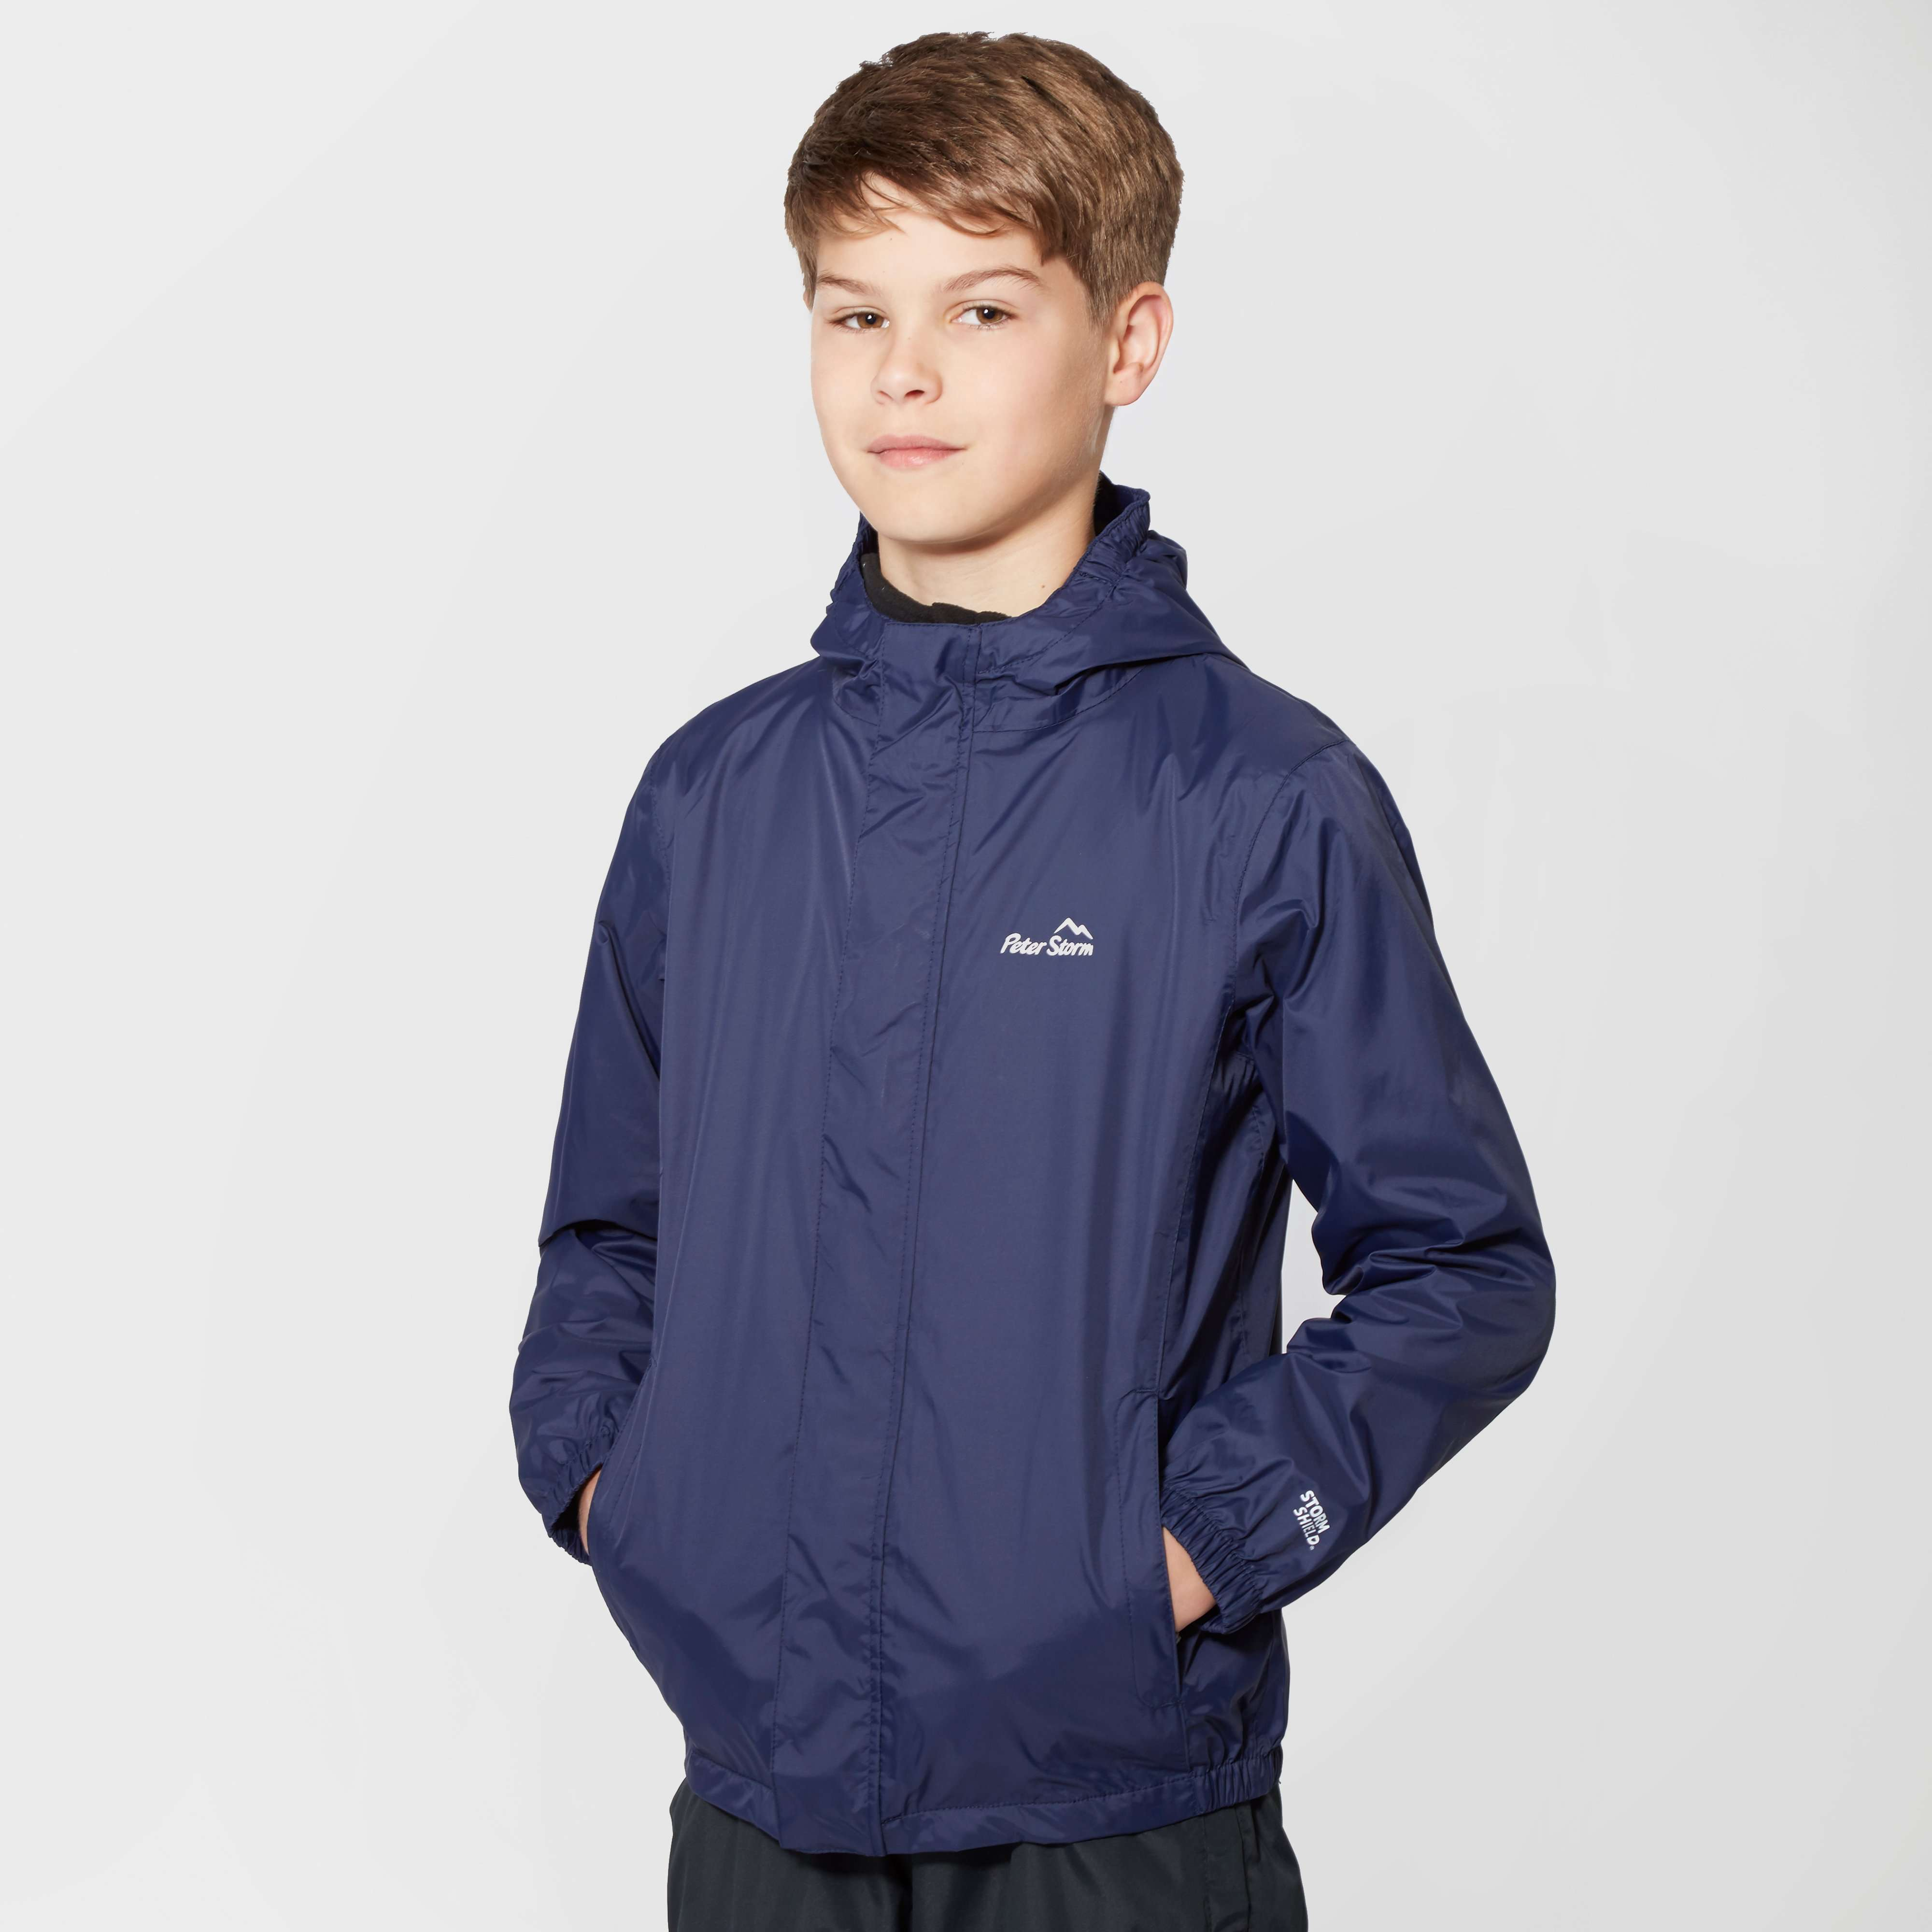 PETER STORM Kids' Unisex Packable Waterproof Jacket